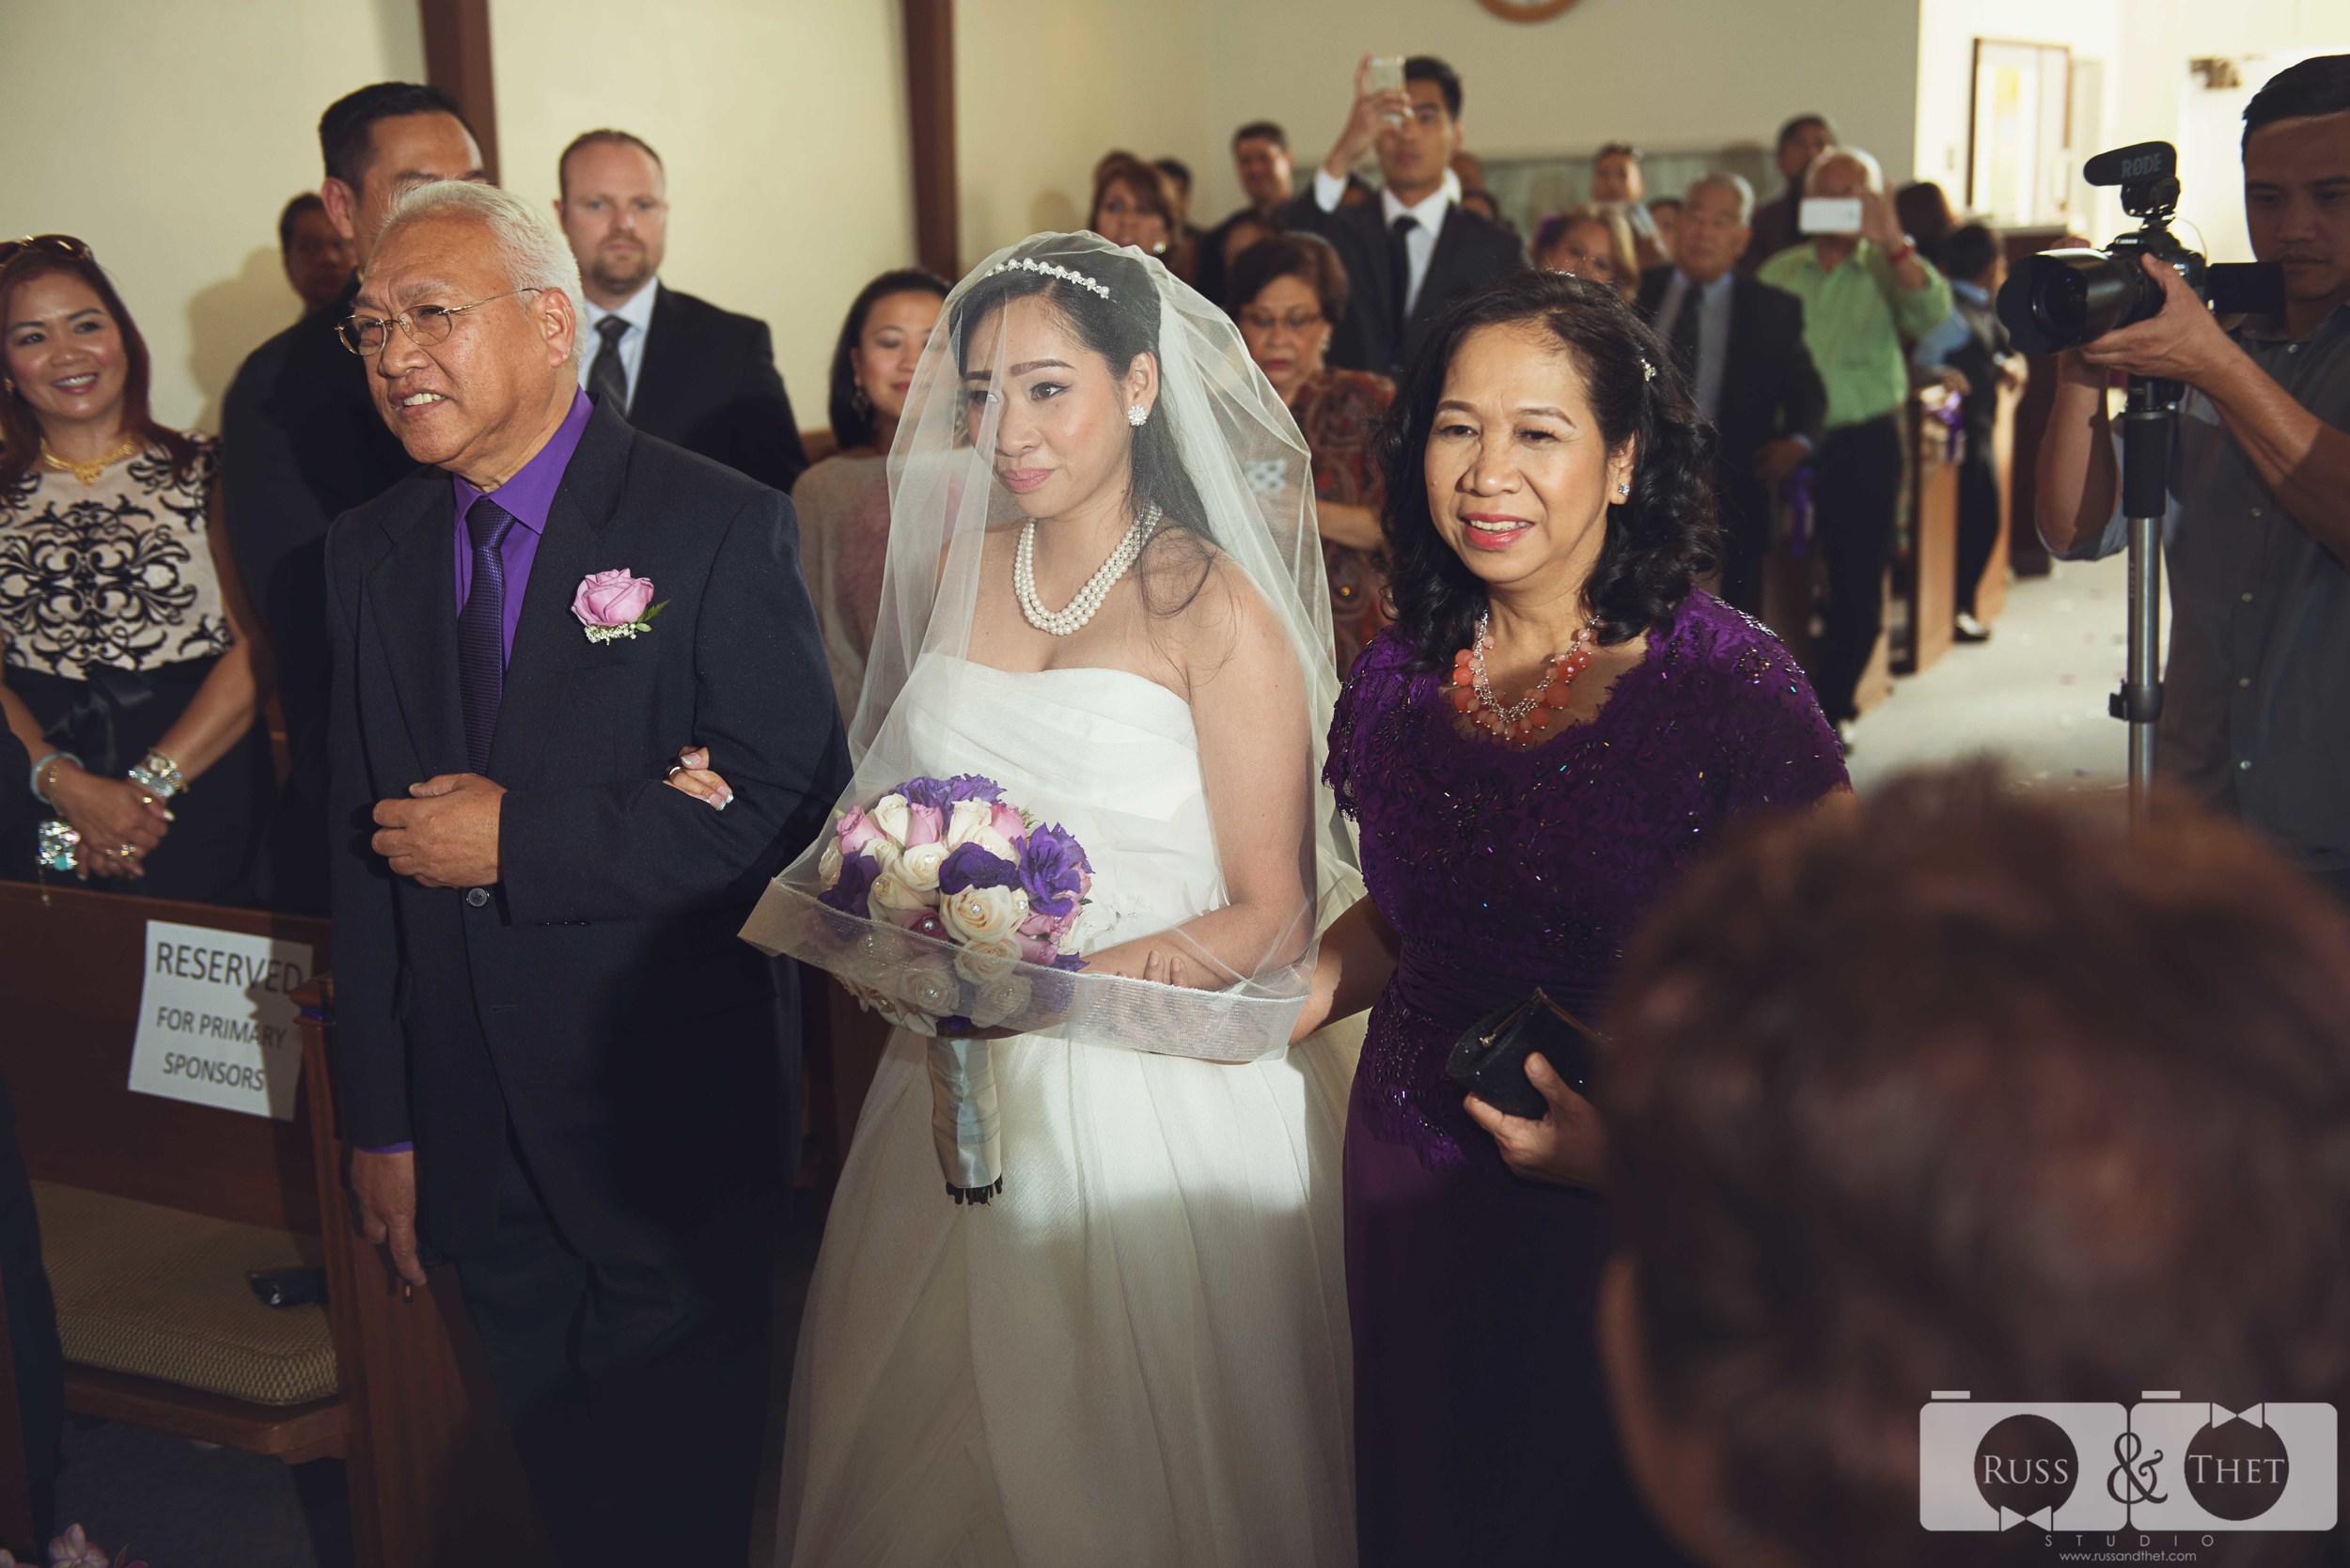 royal-palace-banquet-hall-glendale-wedding-34.JPG